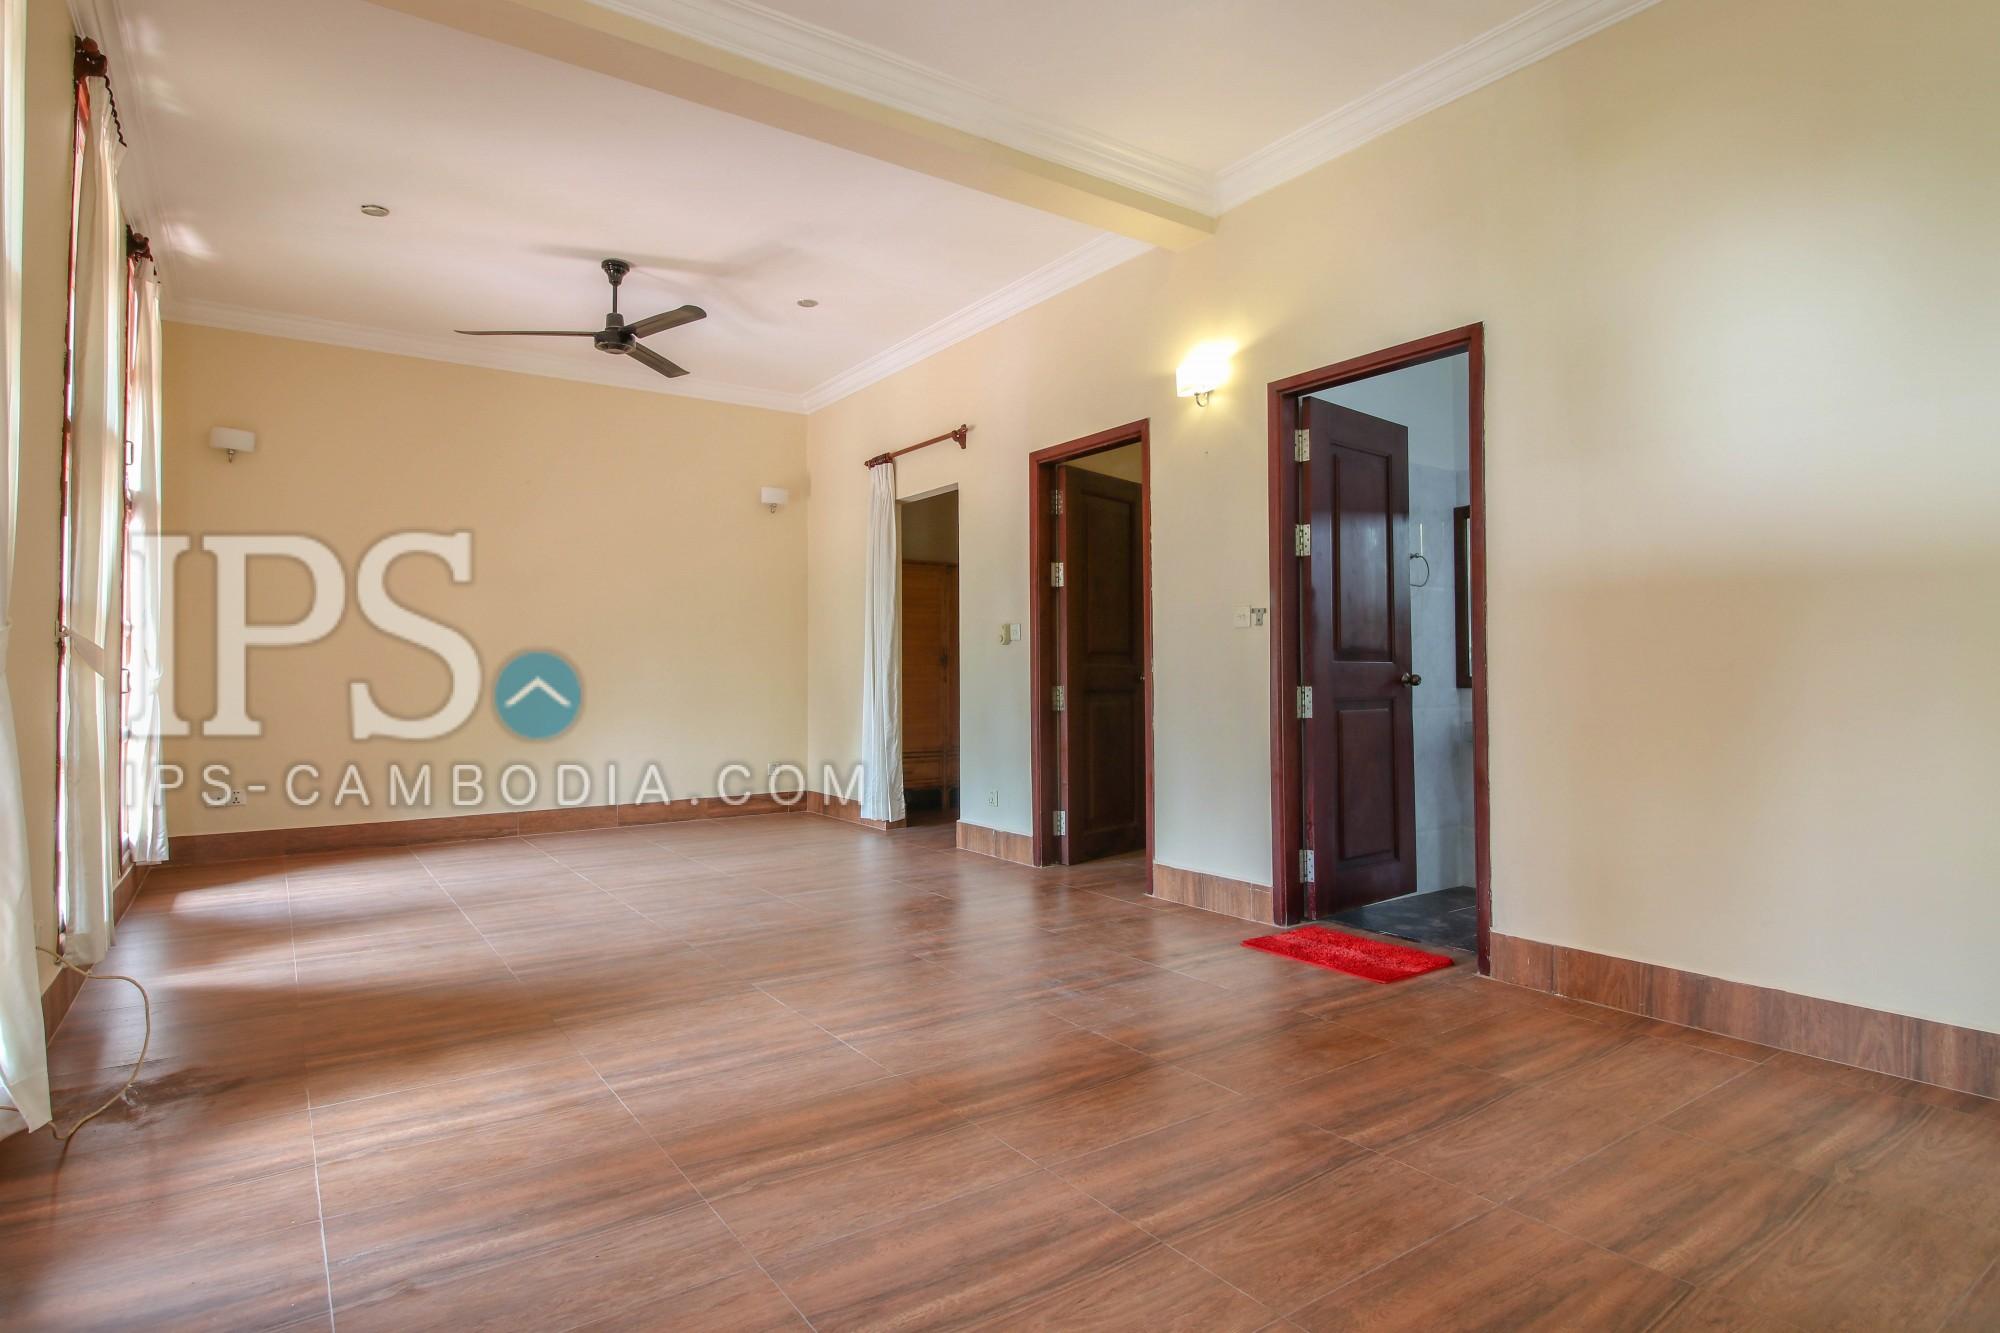 3 Bedroom Commercial Villa For Rent - Boeung Kak 2